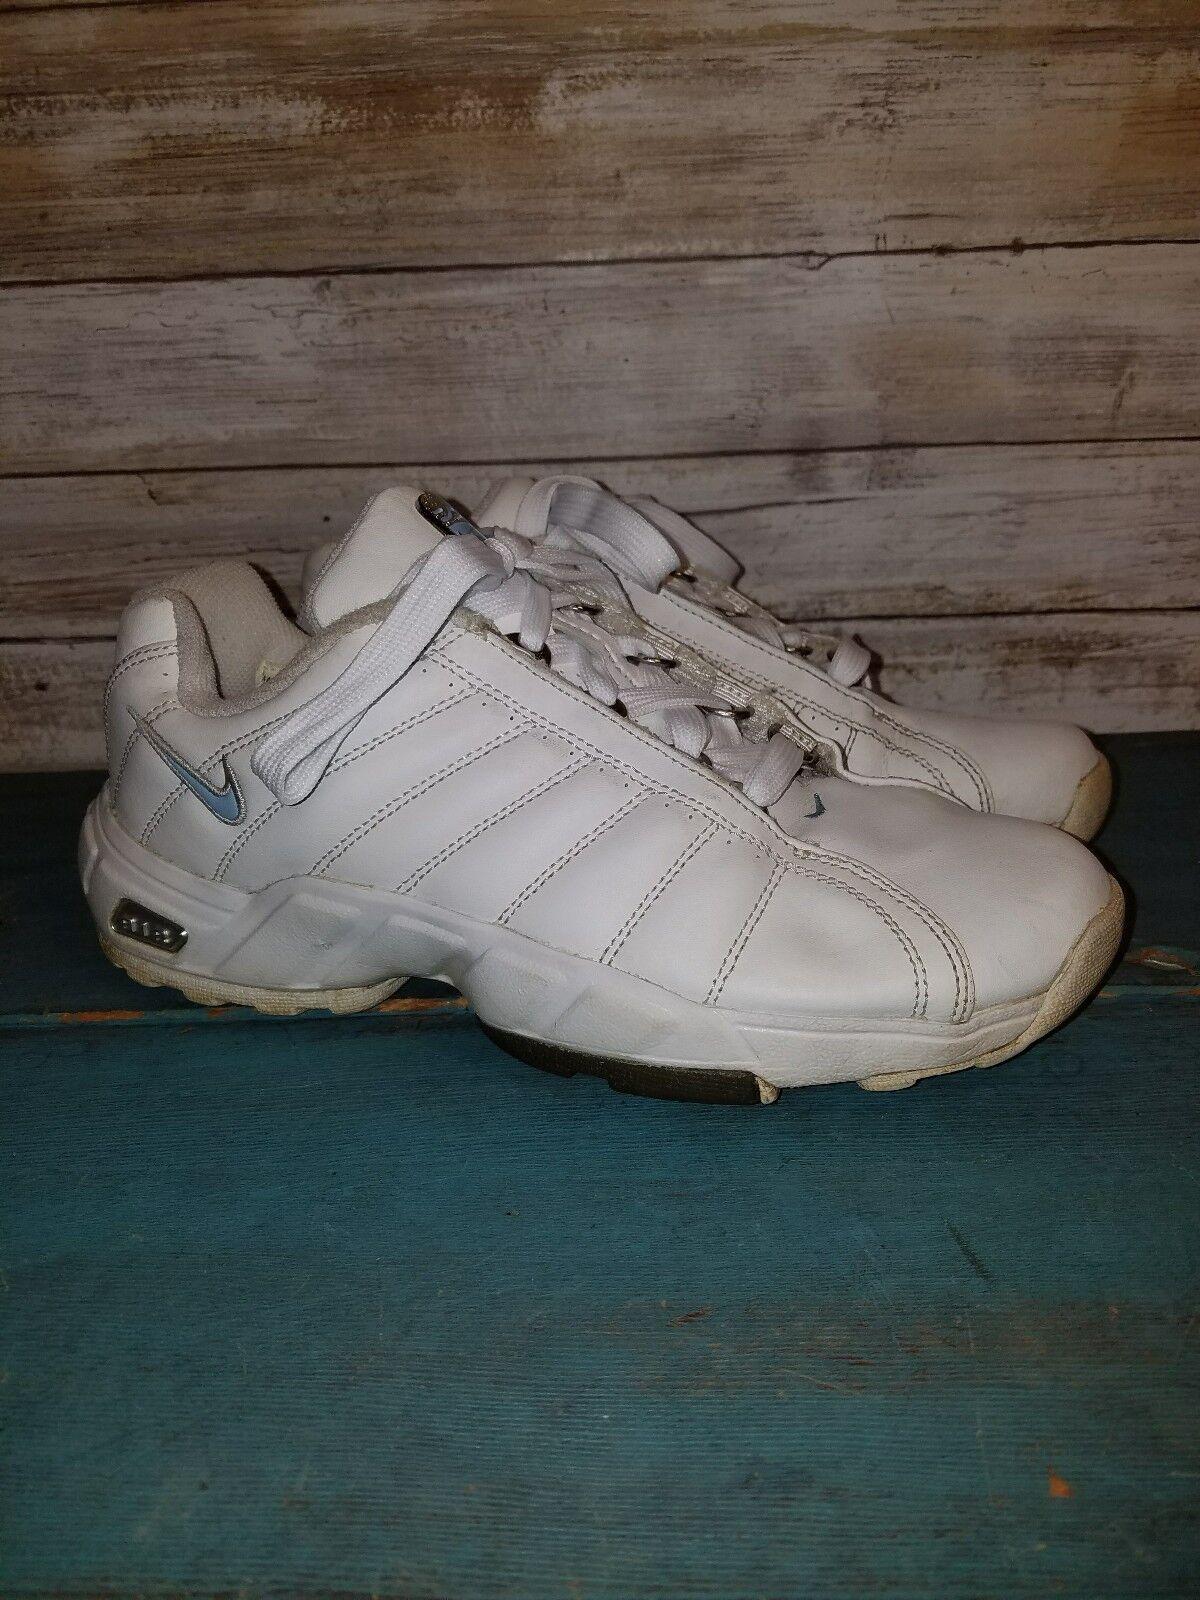 nike air cross cross cross - trainer signore 8 scarpe | Attraente e durevole  | Varietà Grande  | eccellente  | Maschio/Ragazze Scarpa  | Sig/Sig Ra Scarpa  | Uomini/Donne Scarpa  d93bac